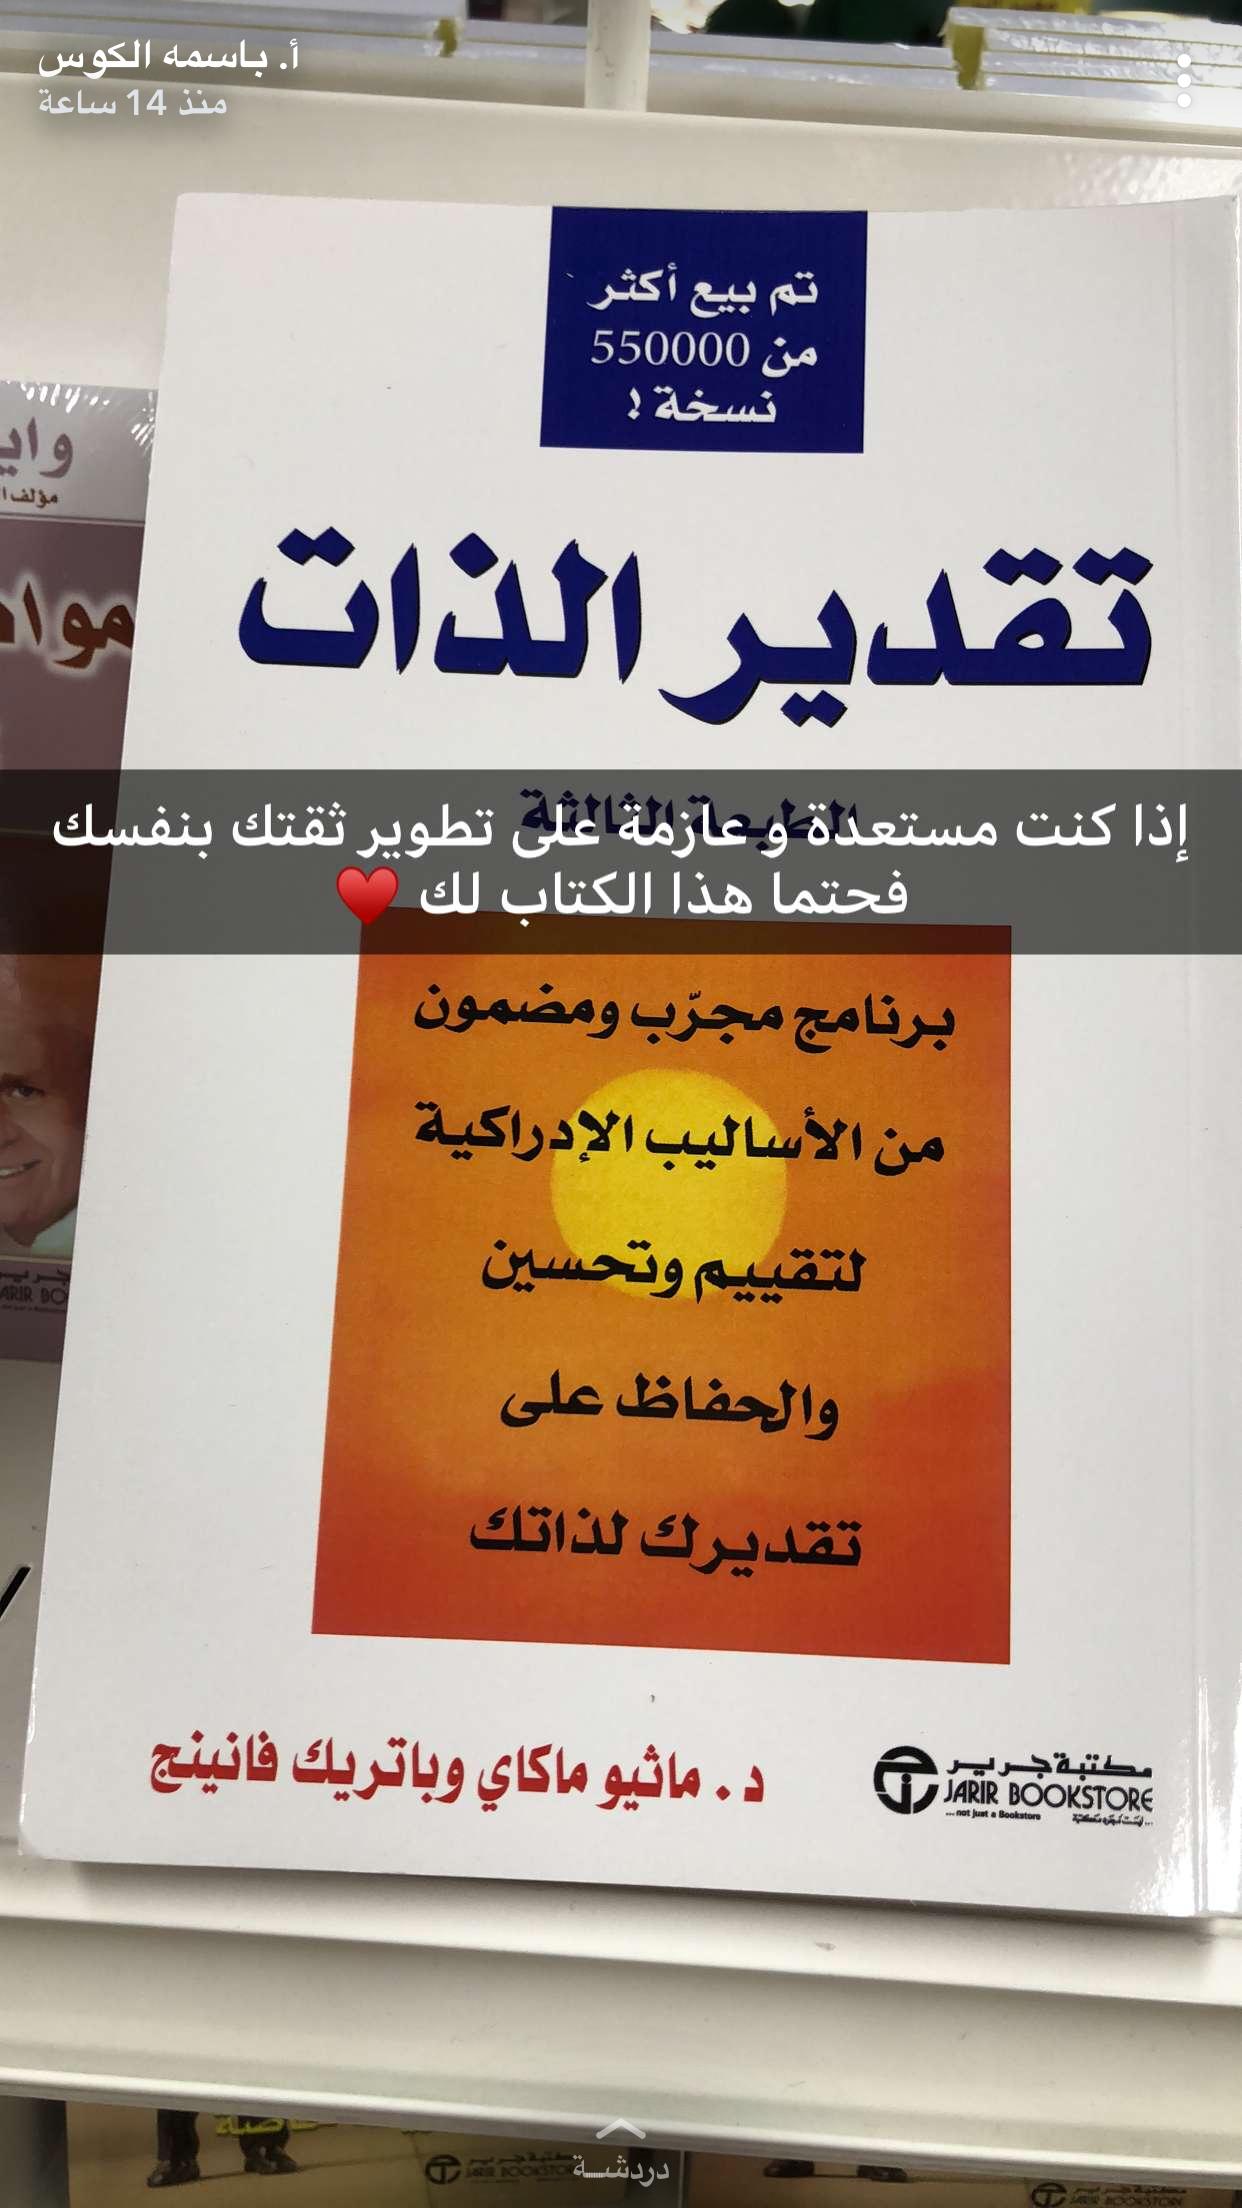 Pin By Kh On كتب Philosophy Books Psychology Books Arabic Books